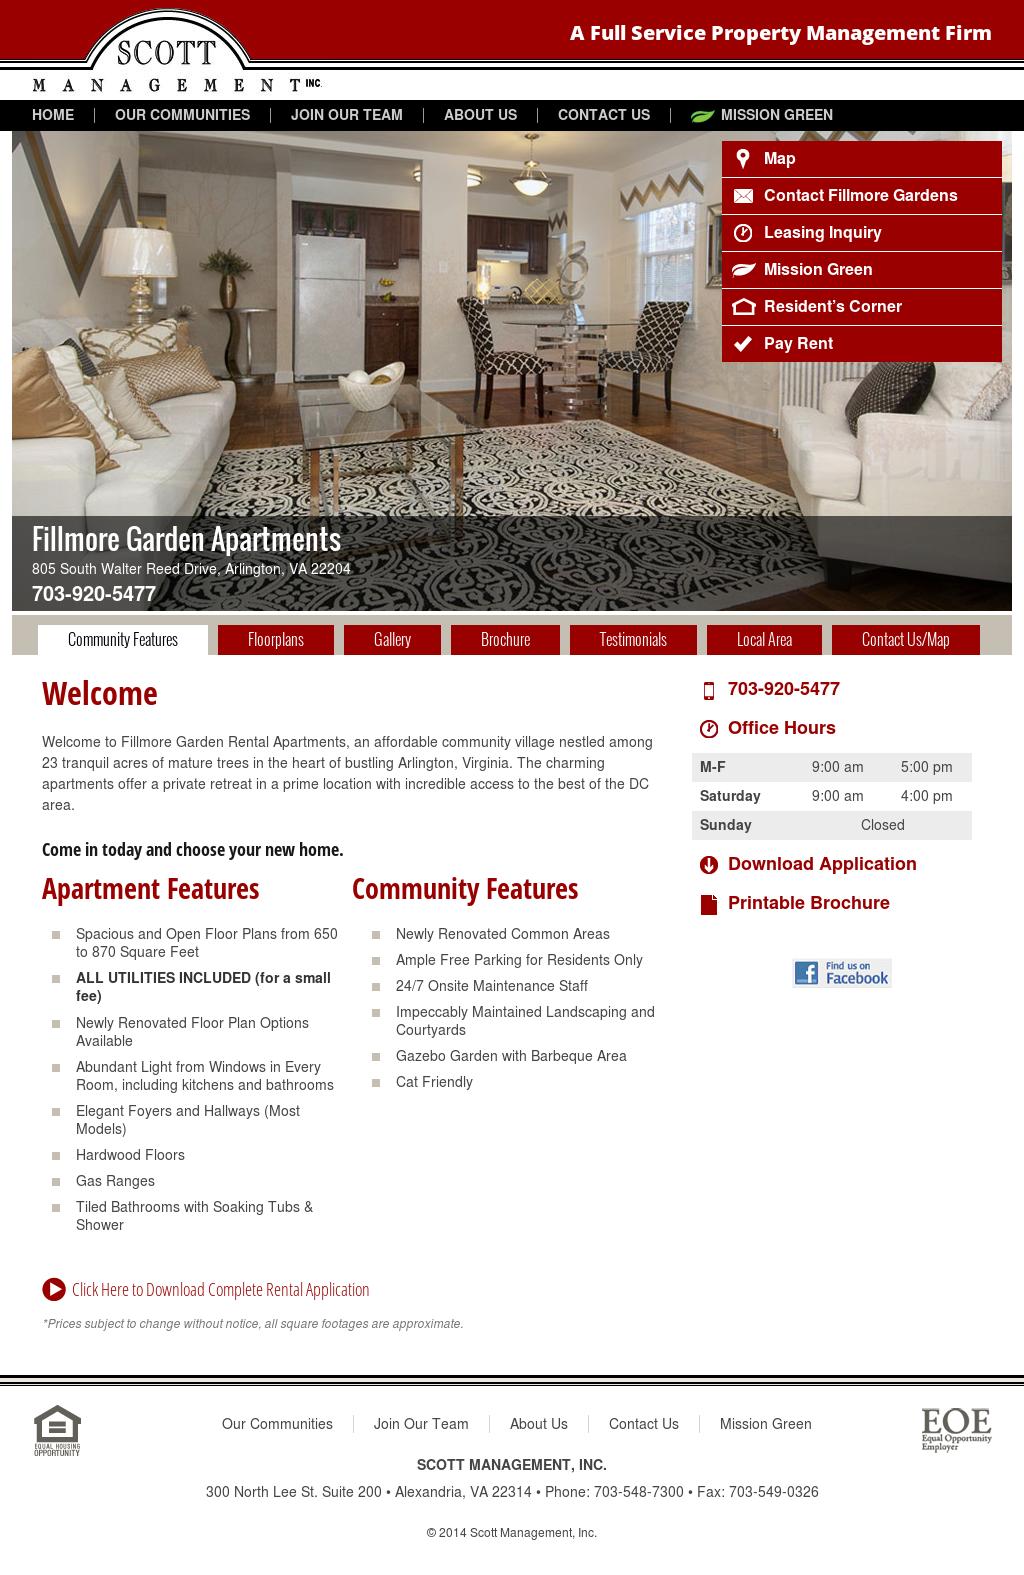 fillmore gardens apartments website history - Fillmore Garden Apartments